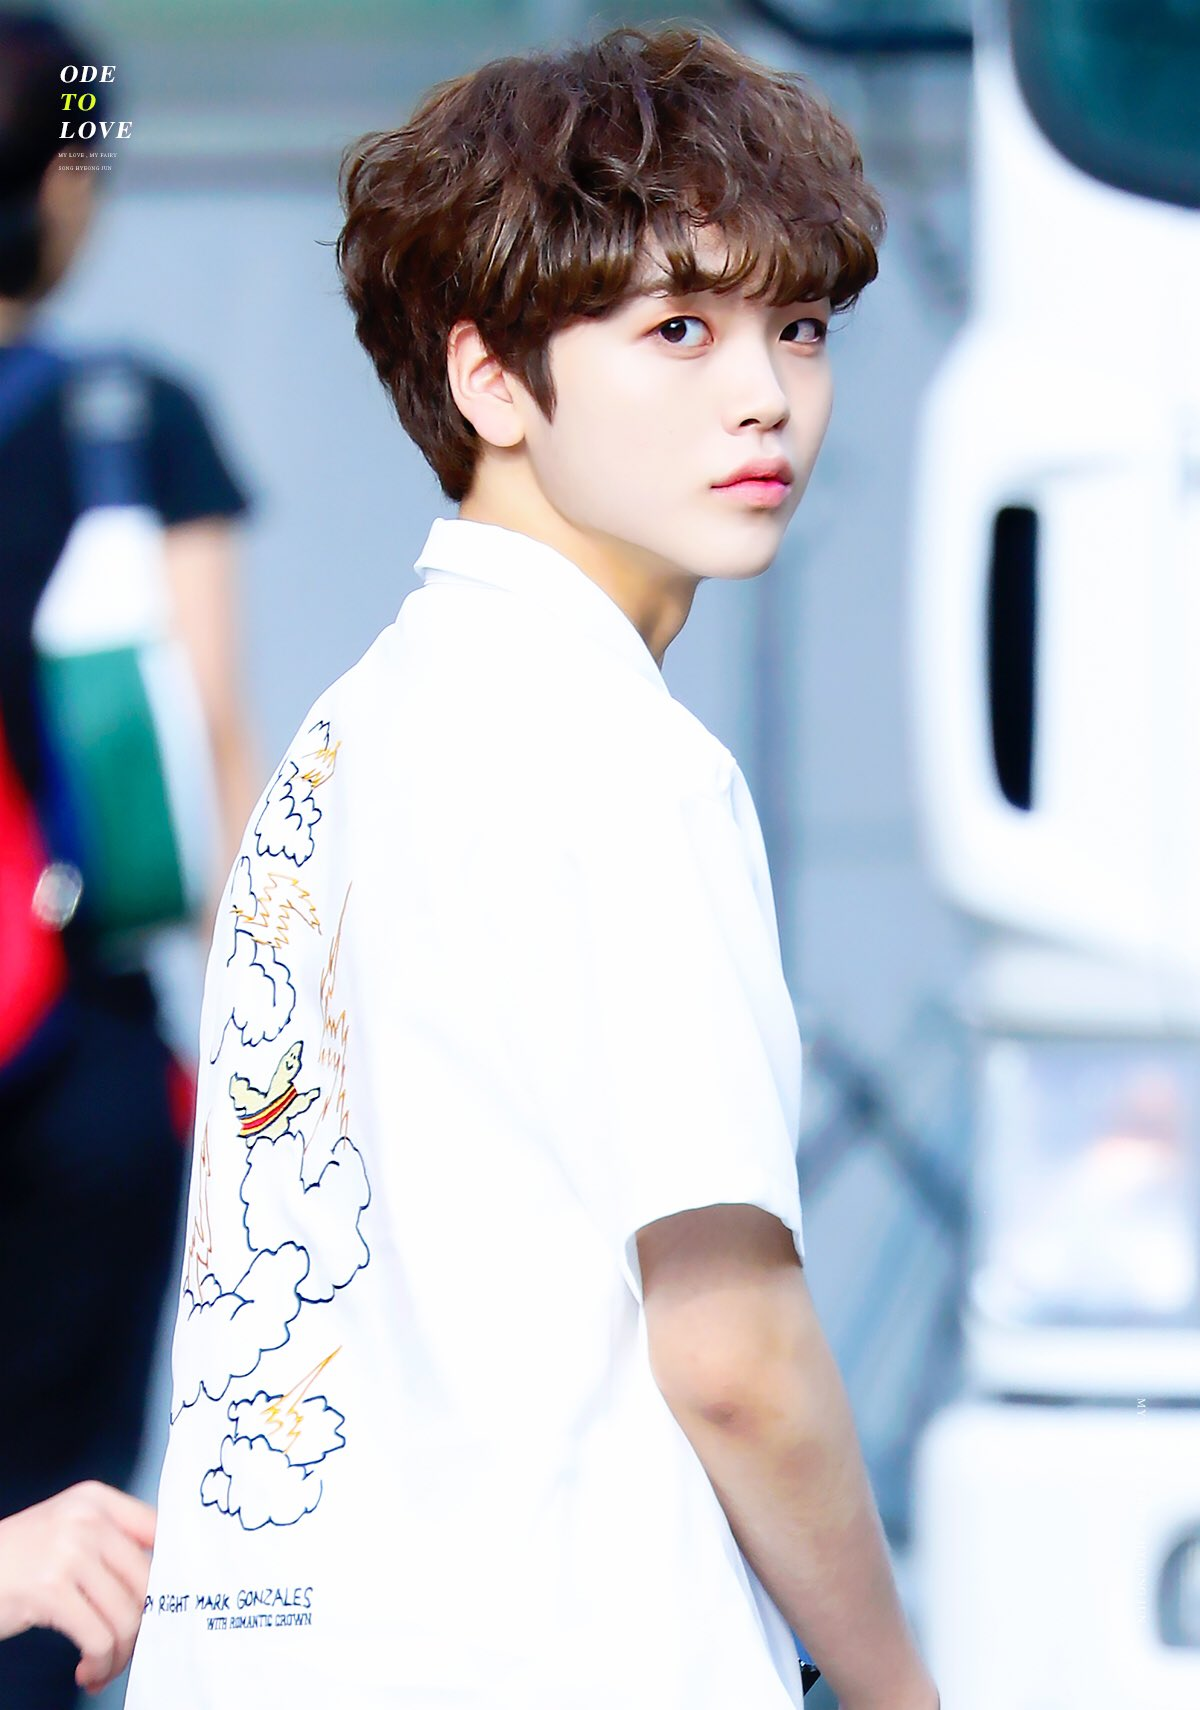 produce x 101, produce x 101 trainees, produce x 101 members, produce x 101 height, produce x 101 company, kpop, trainee, produce x 101 song hyeongjun, song hyeongjun